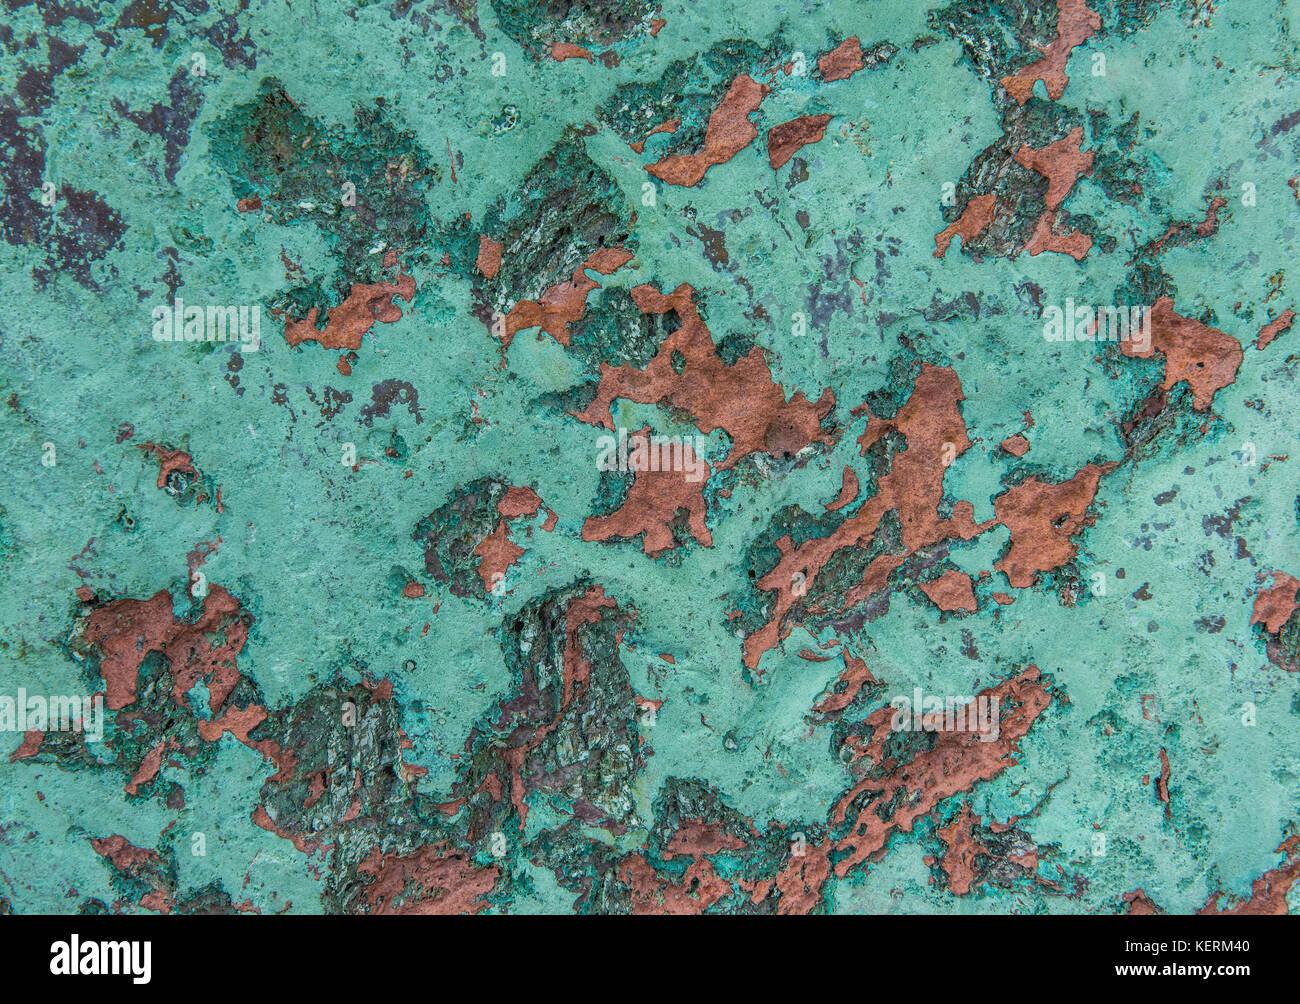 Native Copper specimen, Quincy Mine, Michigan USA by Bruce Montagne/Dembinsky Photo Associates - Stock Image